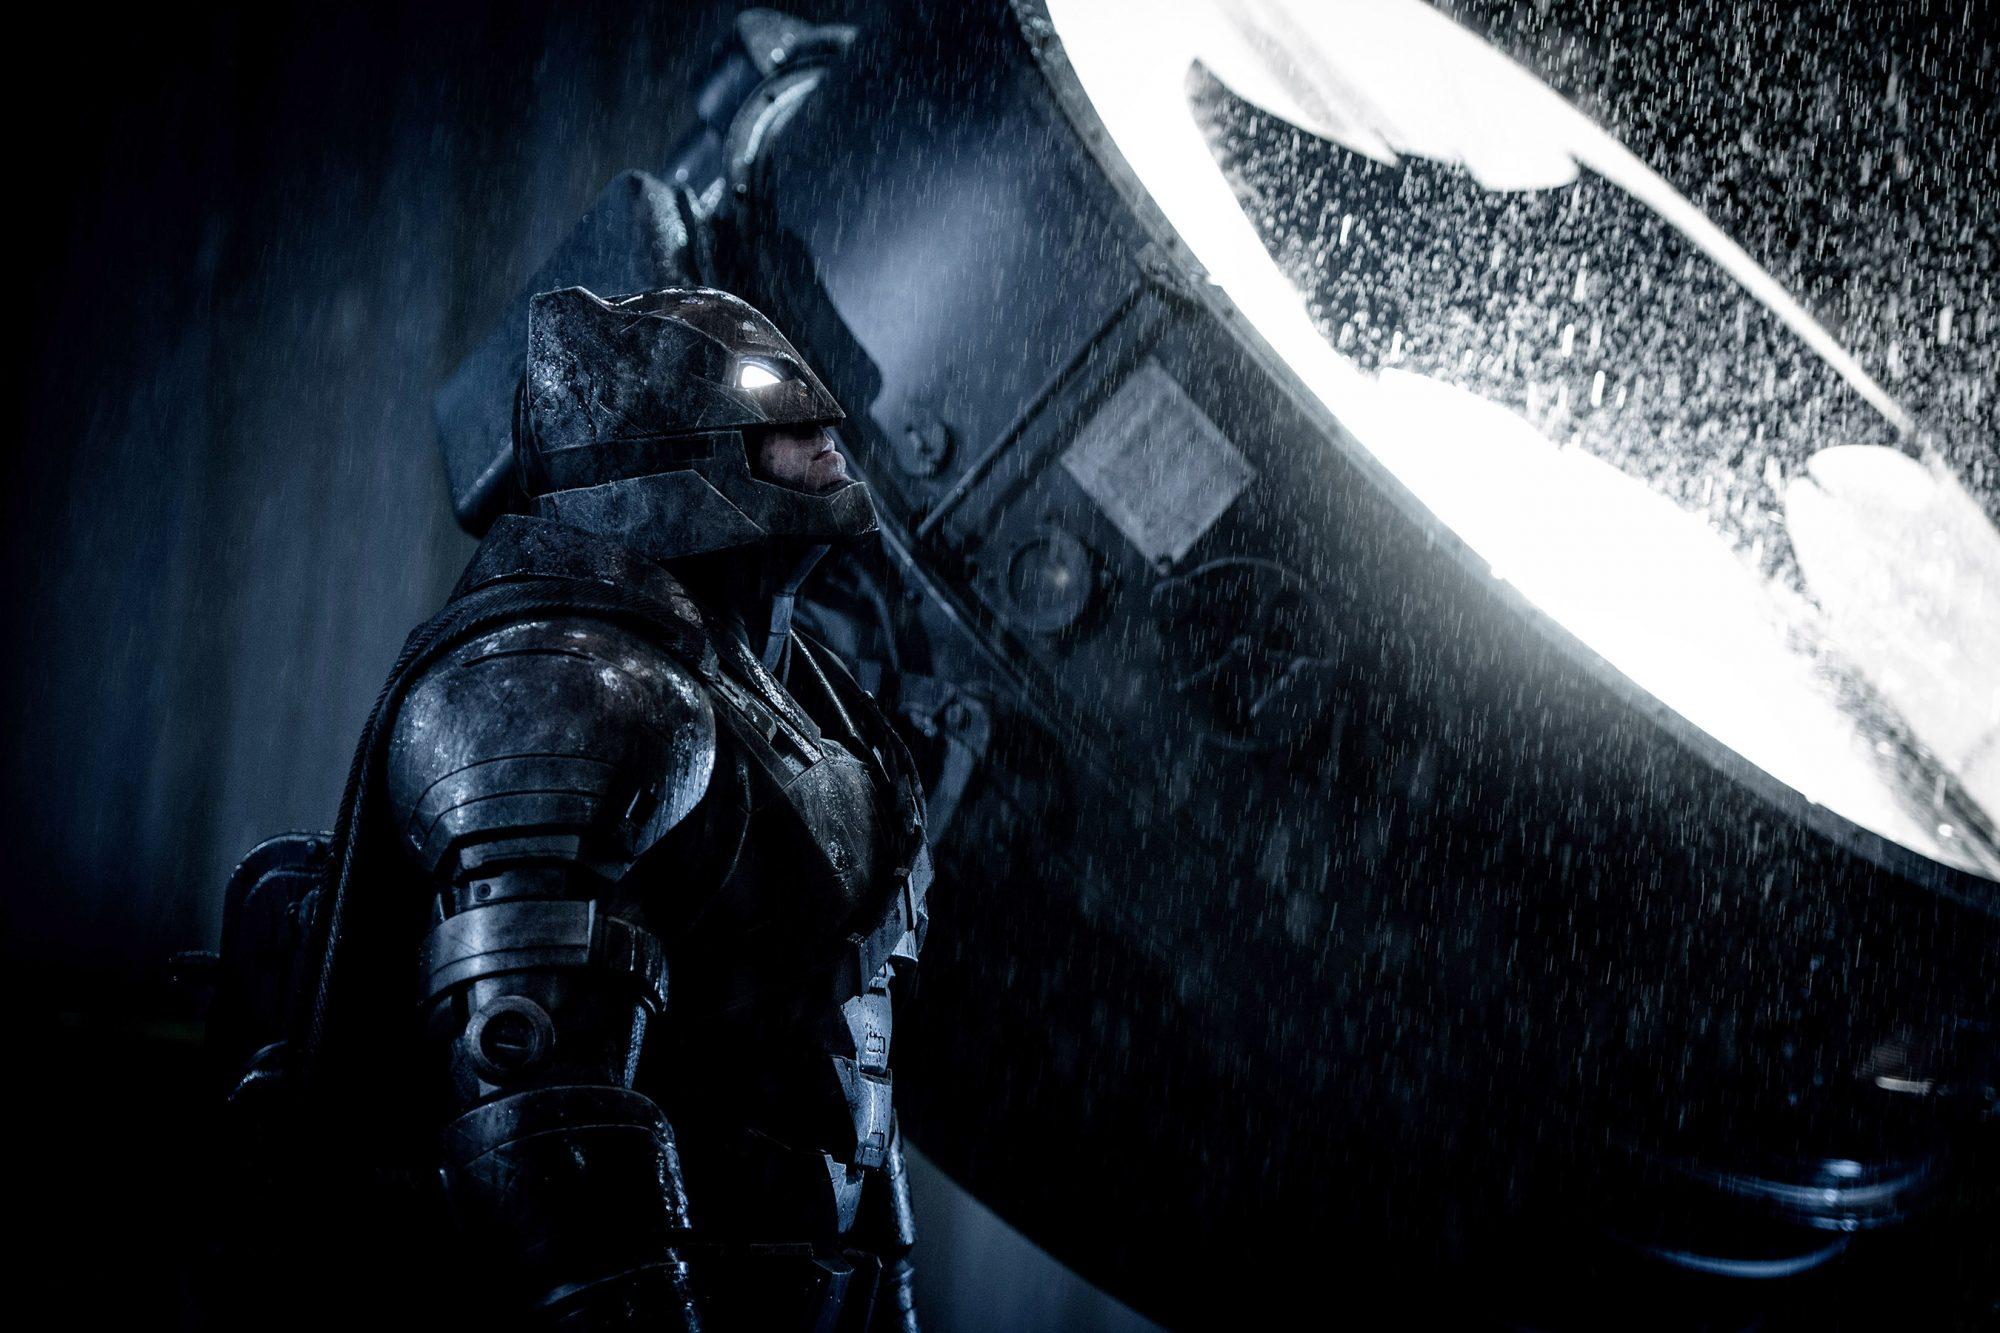 BATMAN V SUPERMAN: DAWN OF JUSTICE, Ben Affleck as Batman, 2016. ph: Clay Enos /© Warner Bros. /